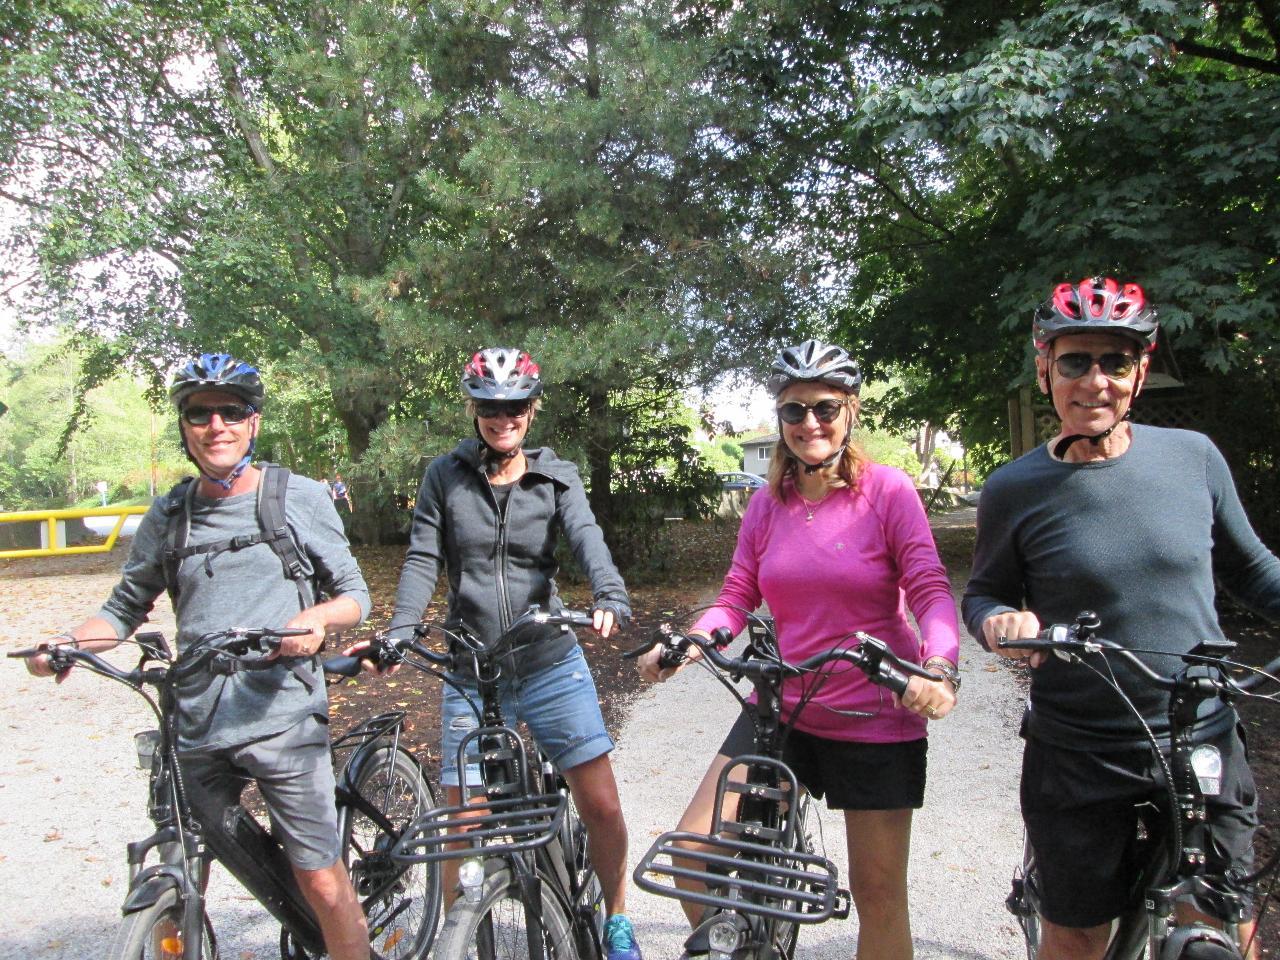 Beyond City Sights E-Bike Adventure Tour - Guided